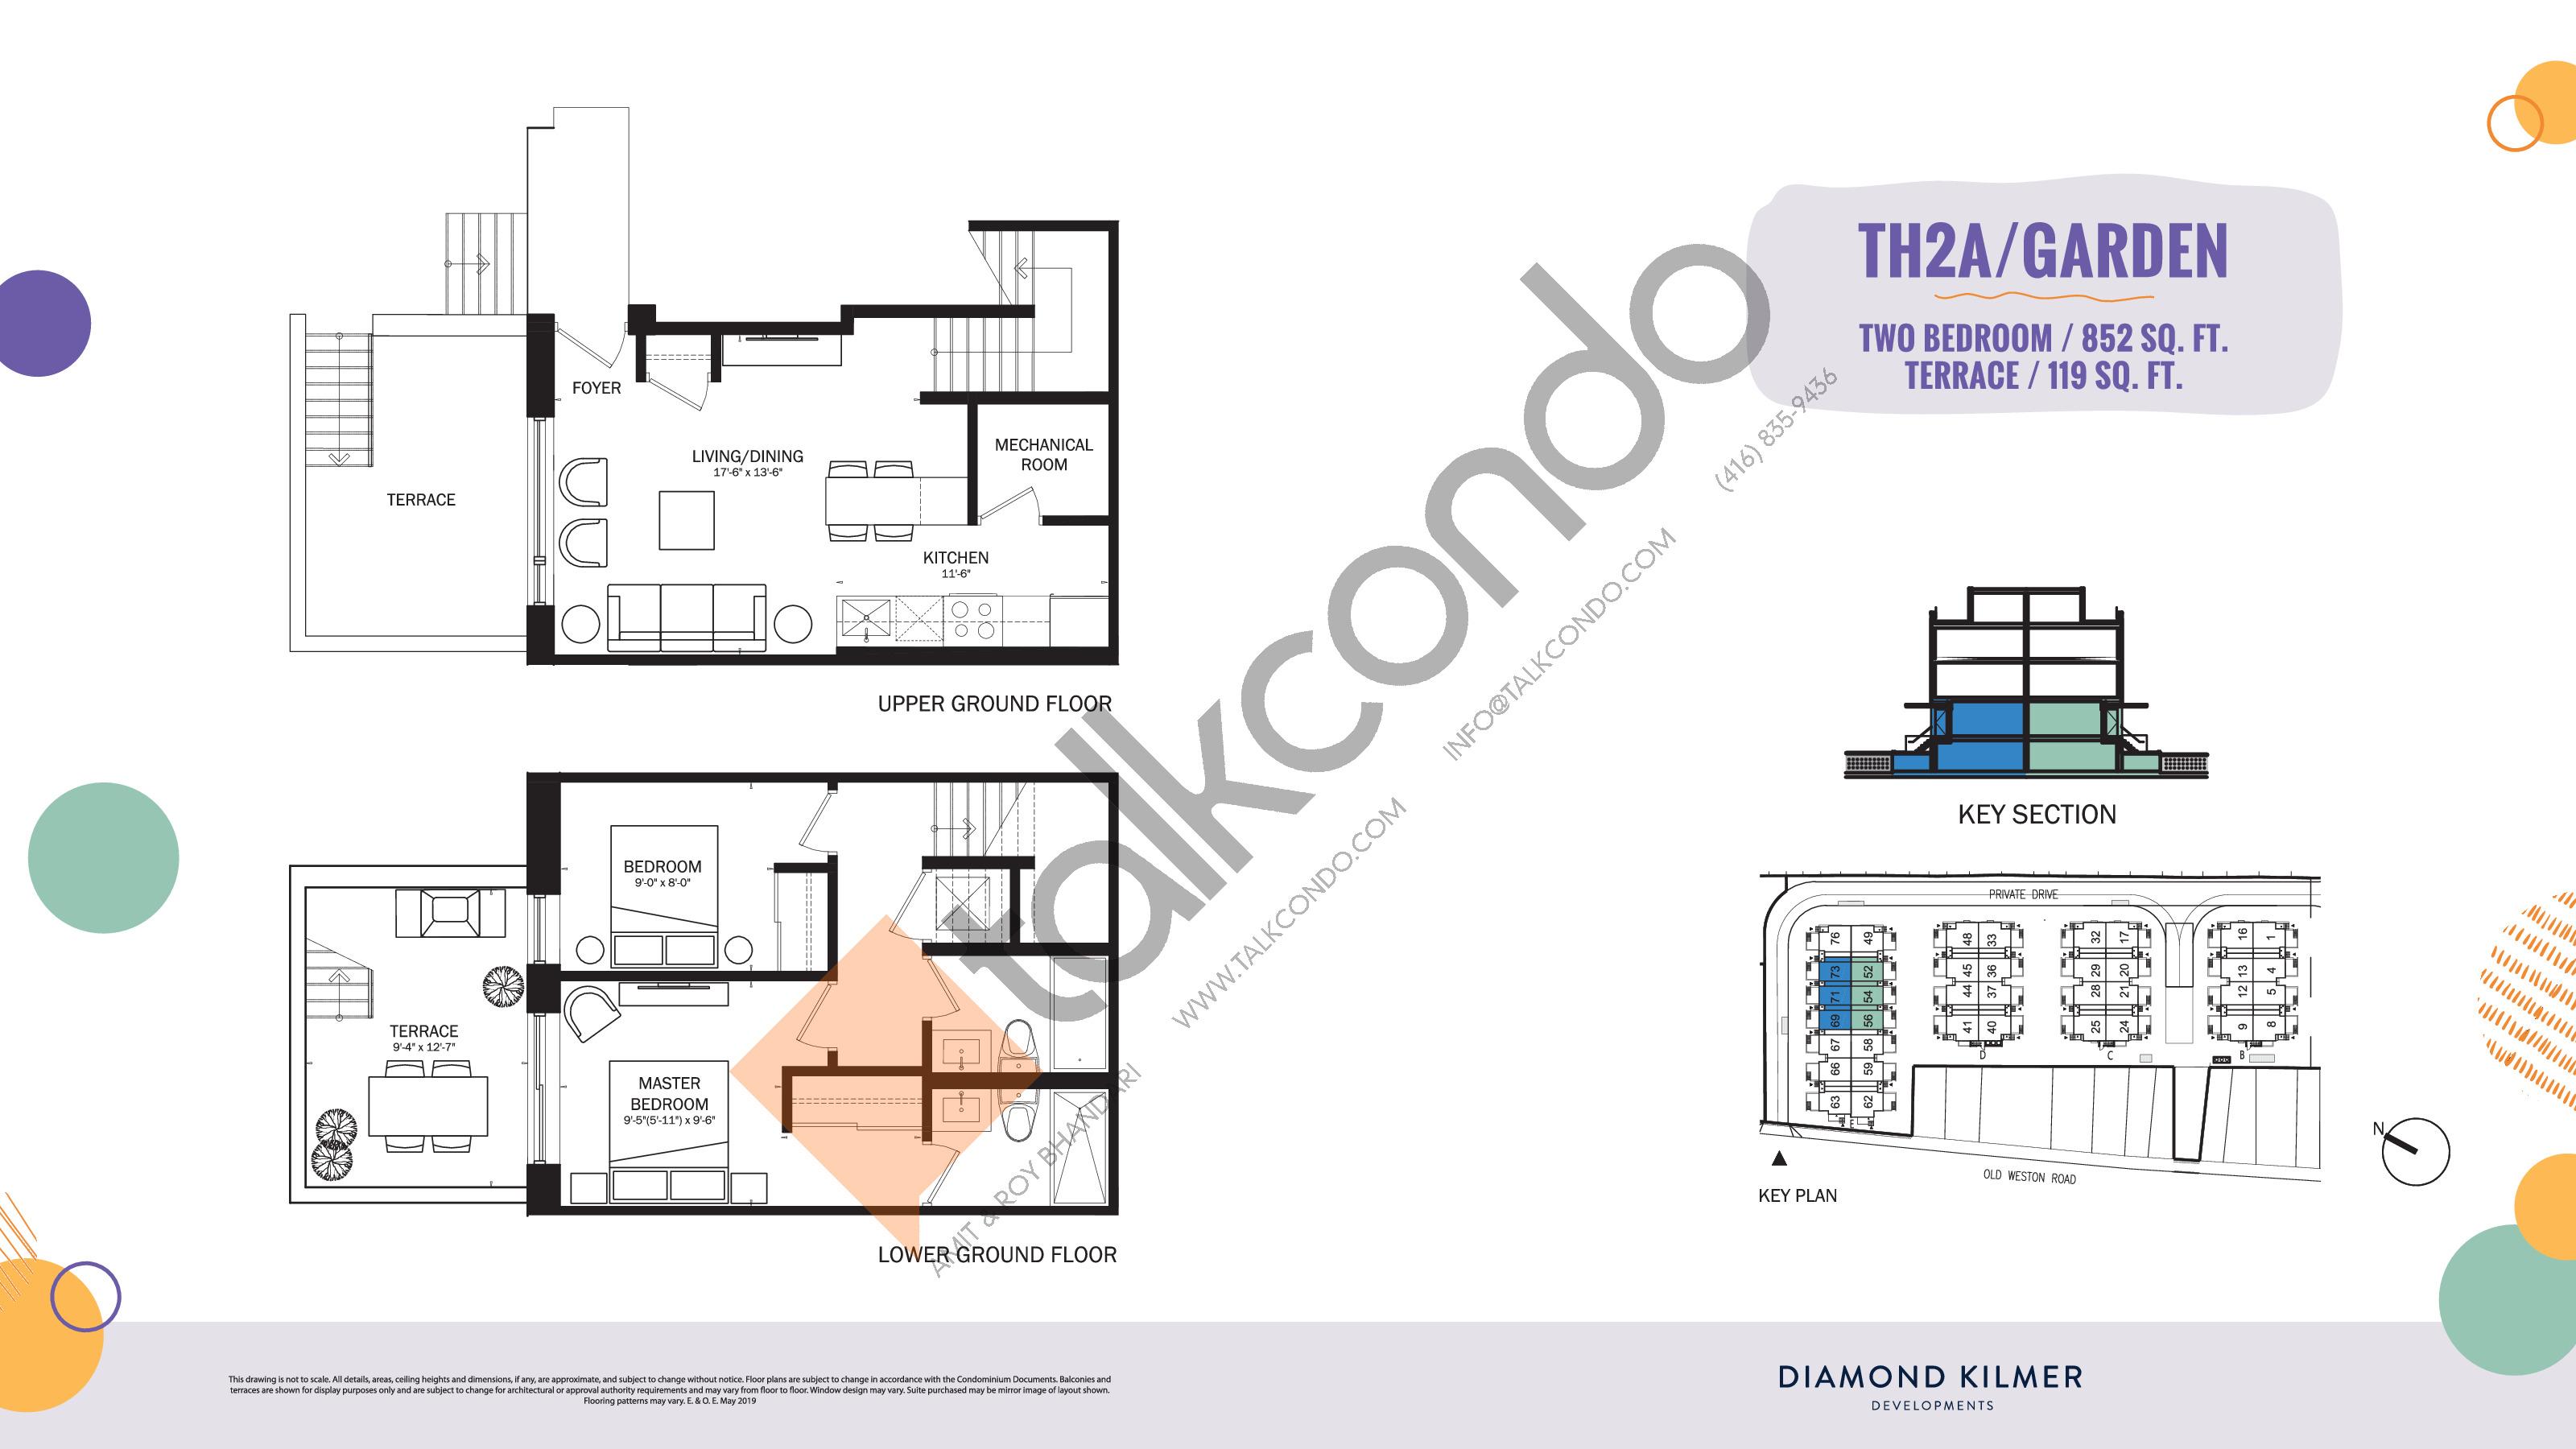 TH2A/Garden Floor Plan at Reunion Crossing Condos & Urban Towns - 852 sq.ft